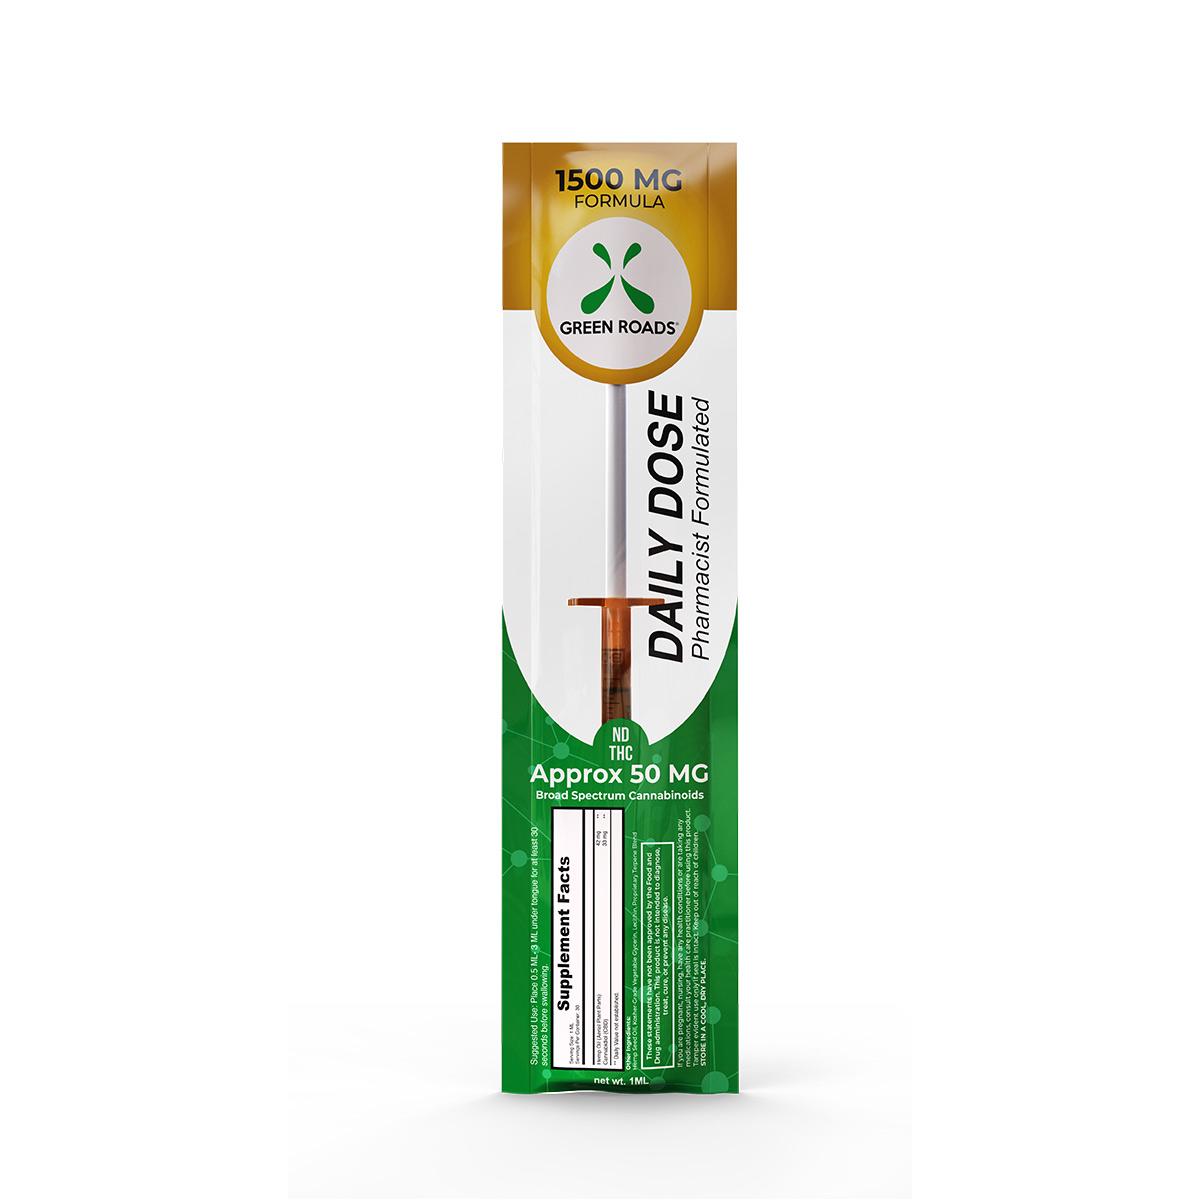 CBD Daily Dose – 1500 mg Formula Green Roads CBD